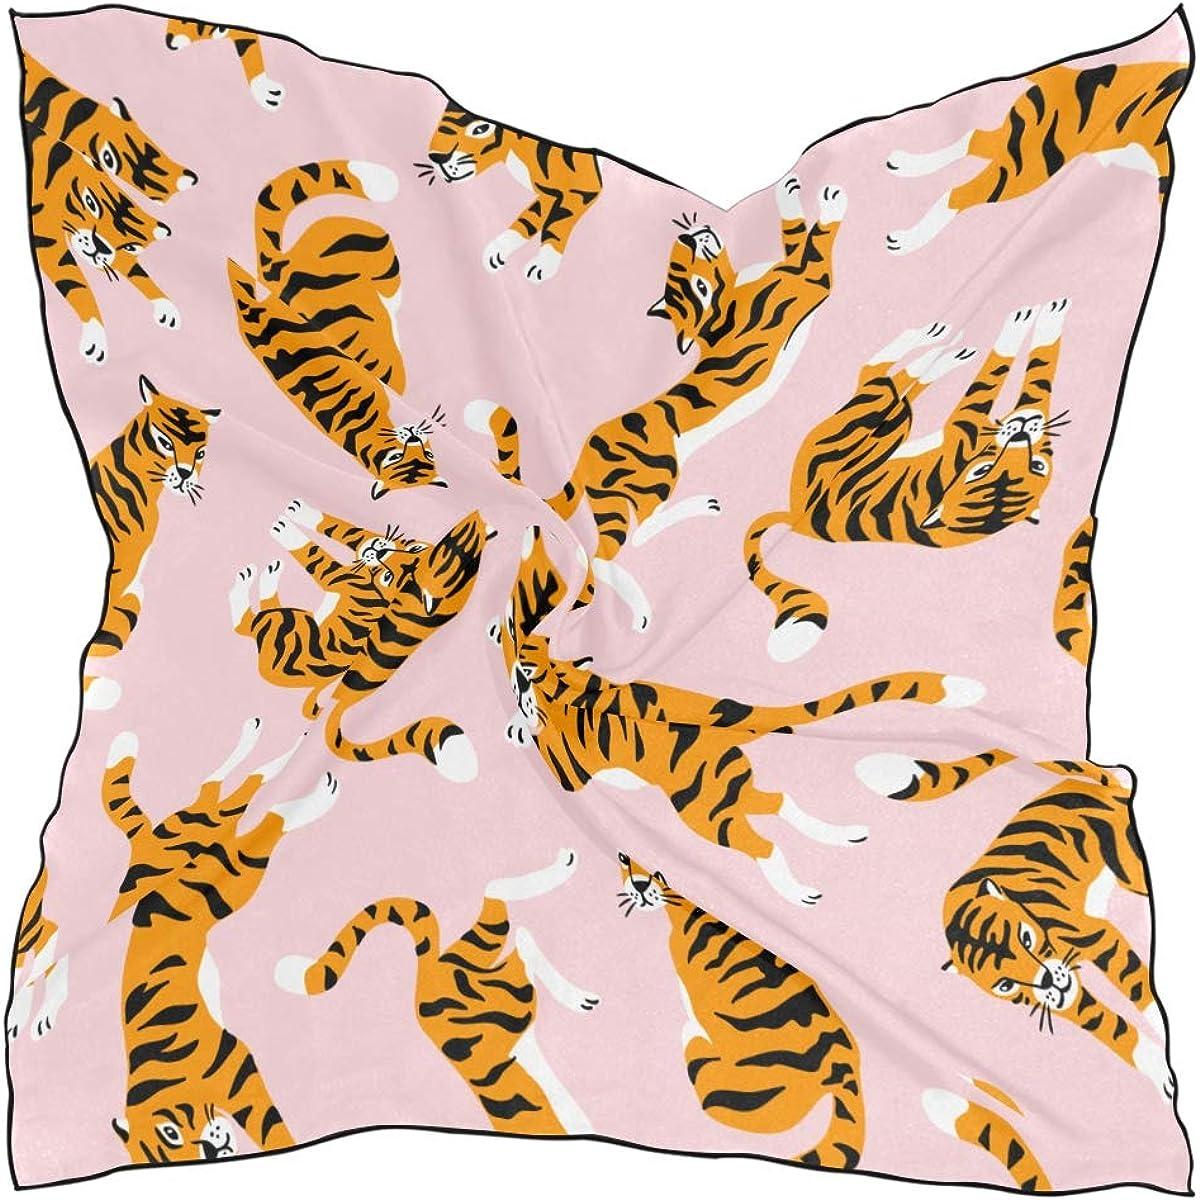 Women's Soft Polyester Silk Square Scarf Tiger Cartoon Animal Beast Leopard Print Speed Design Forest Fashion Print Head & Hair Scarf Neckerchief Accessory-23.6x23.6 Inch